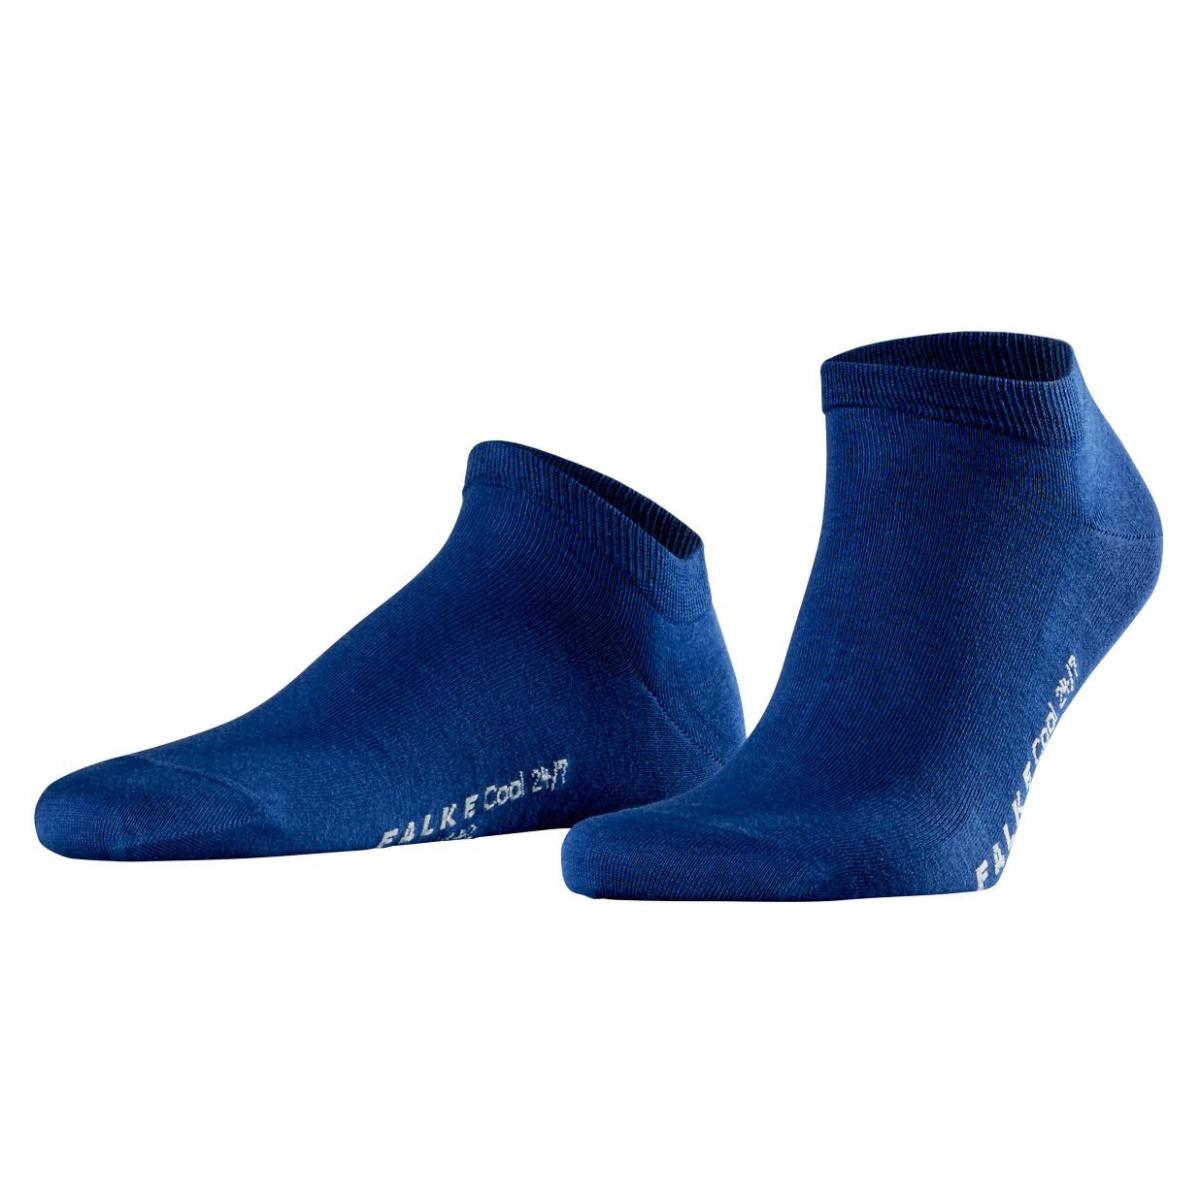 Falke Tagessocke Cool 247 Sneaker dunkelblau Herren 1er